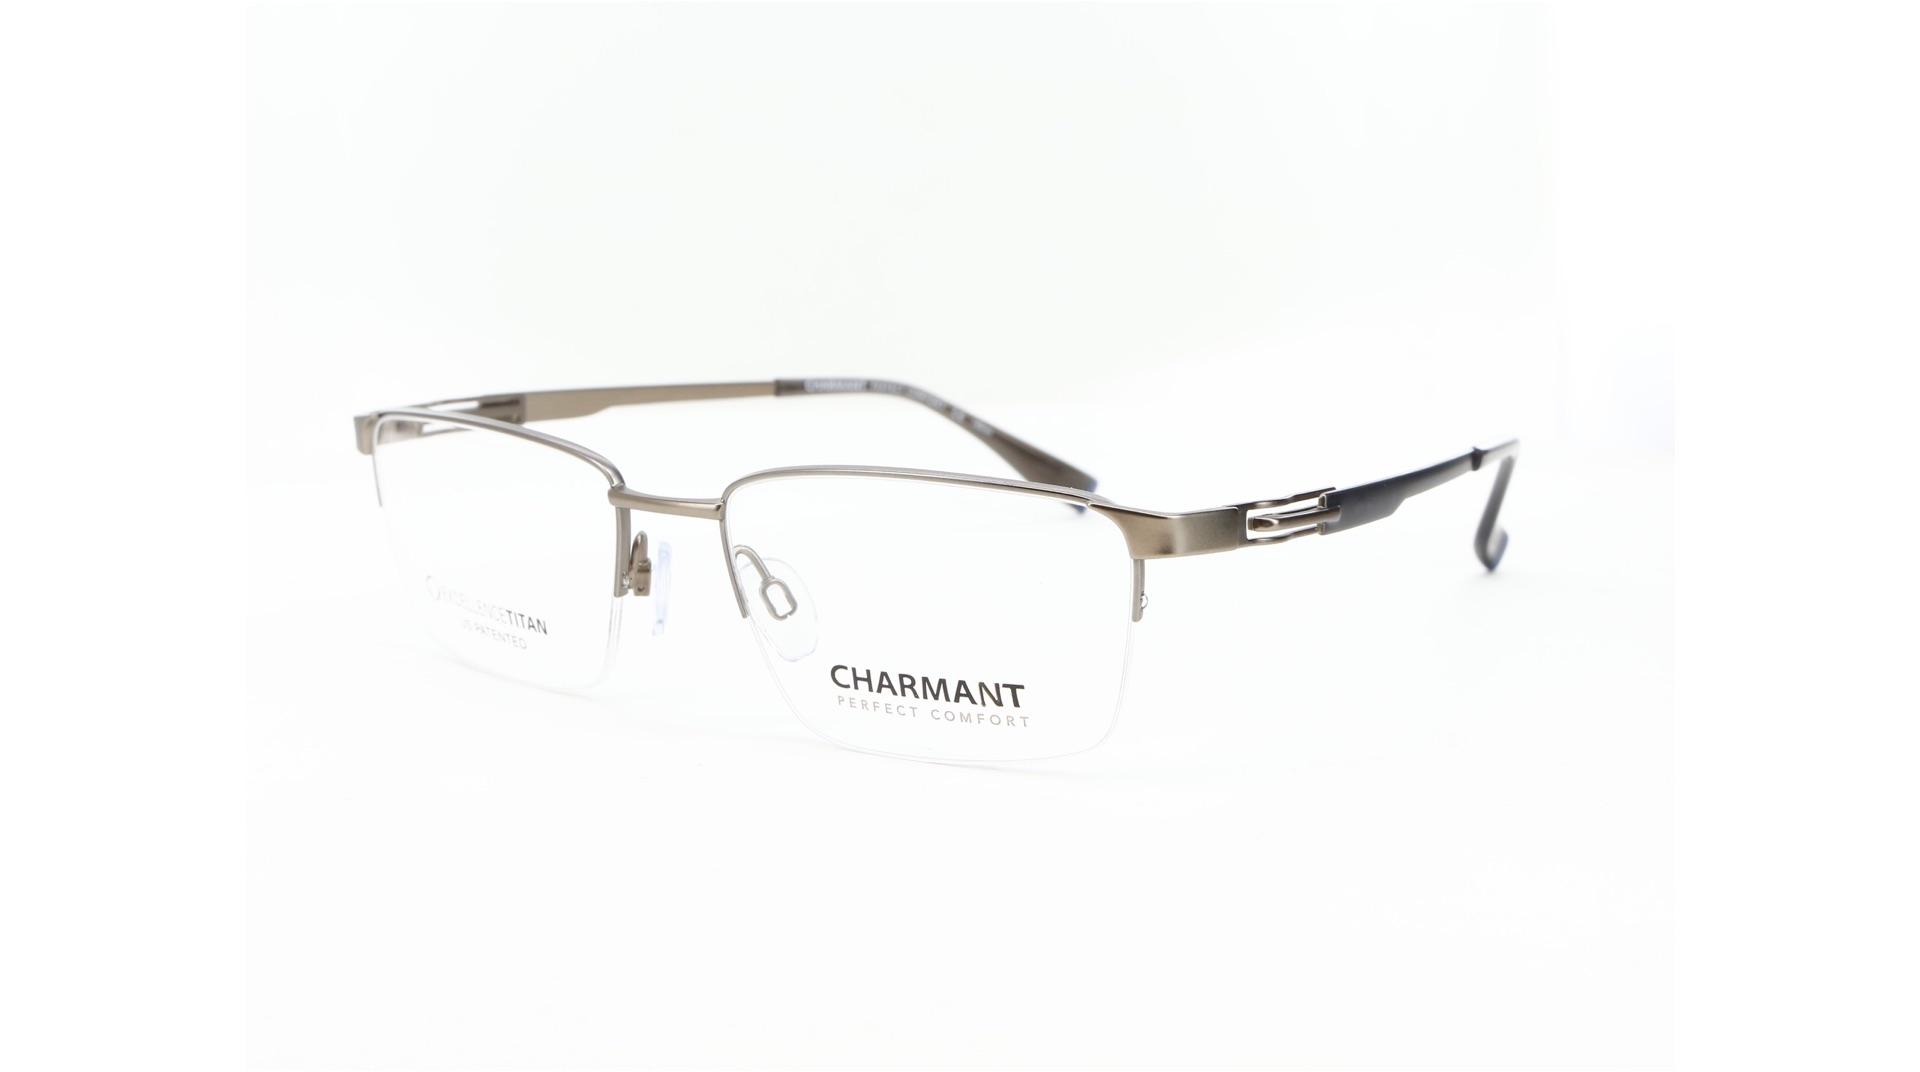 Charmant - ref: 81894